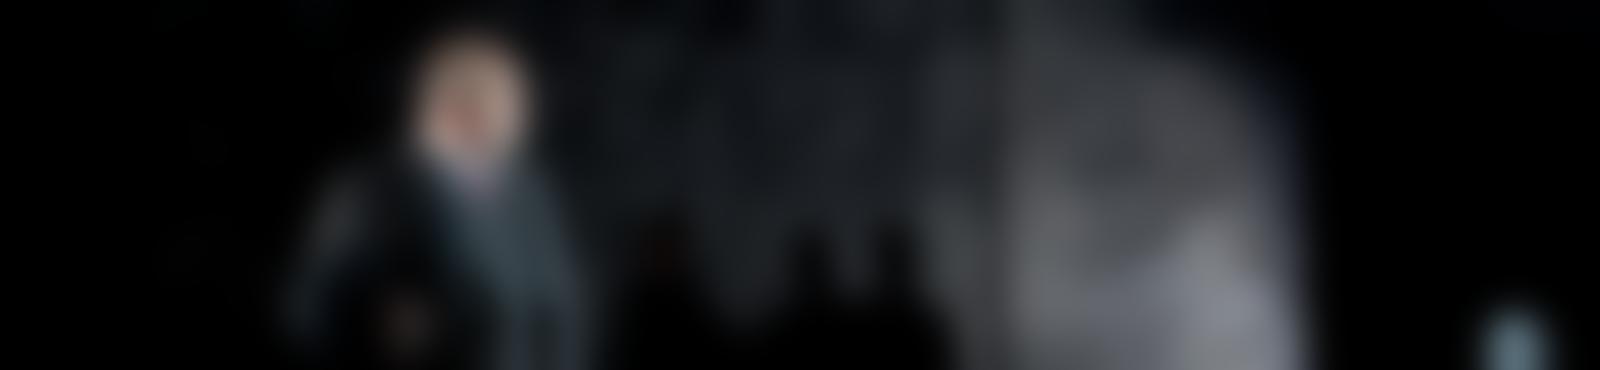 Blurred 146d4651 0c72 4eb4 8fce 2e0831b64f65